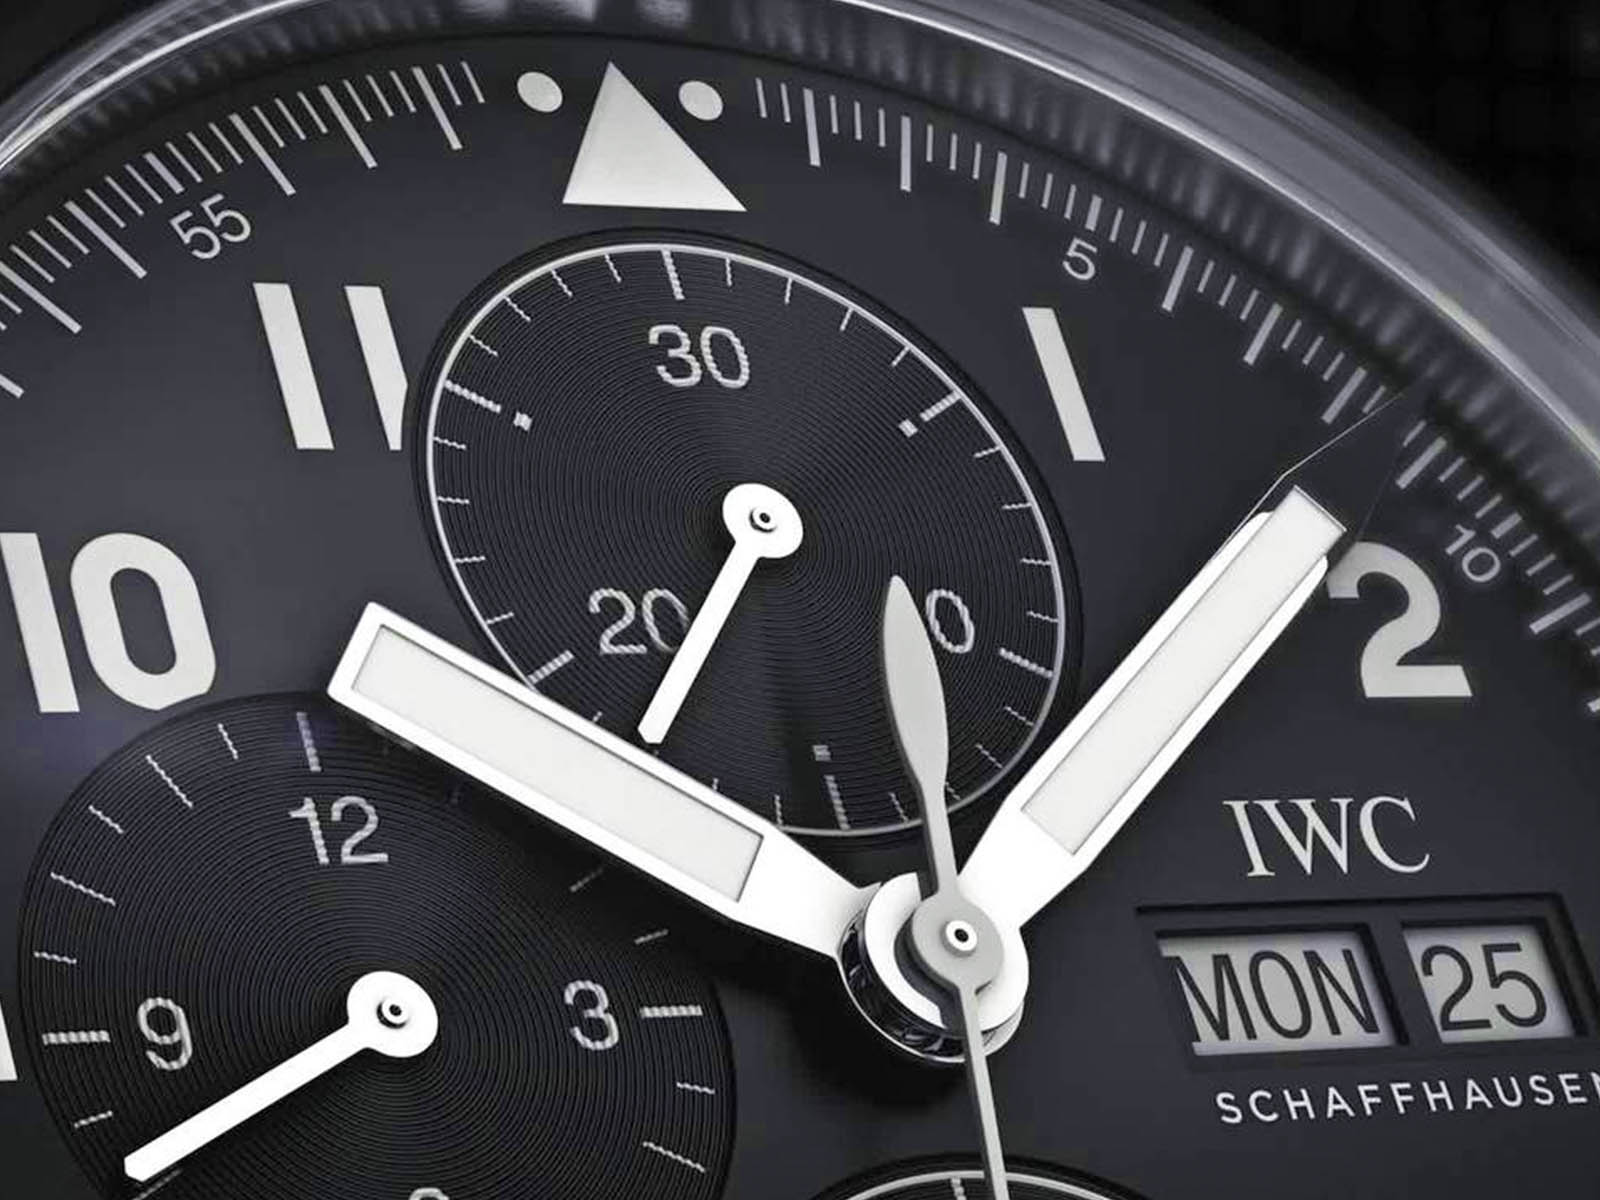 iw387905-iwc-pilot-s-chronograph-tribute-to-3705-4.jpg